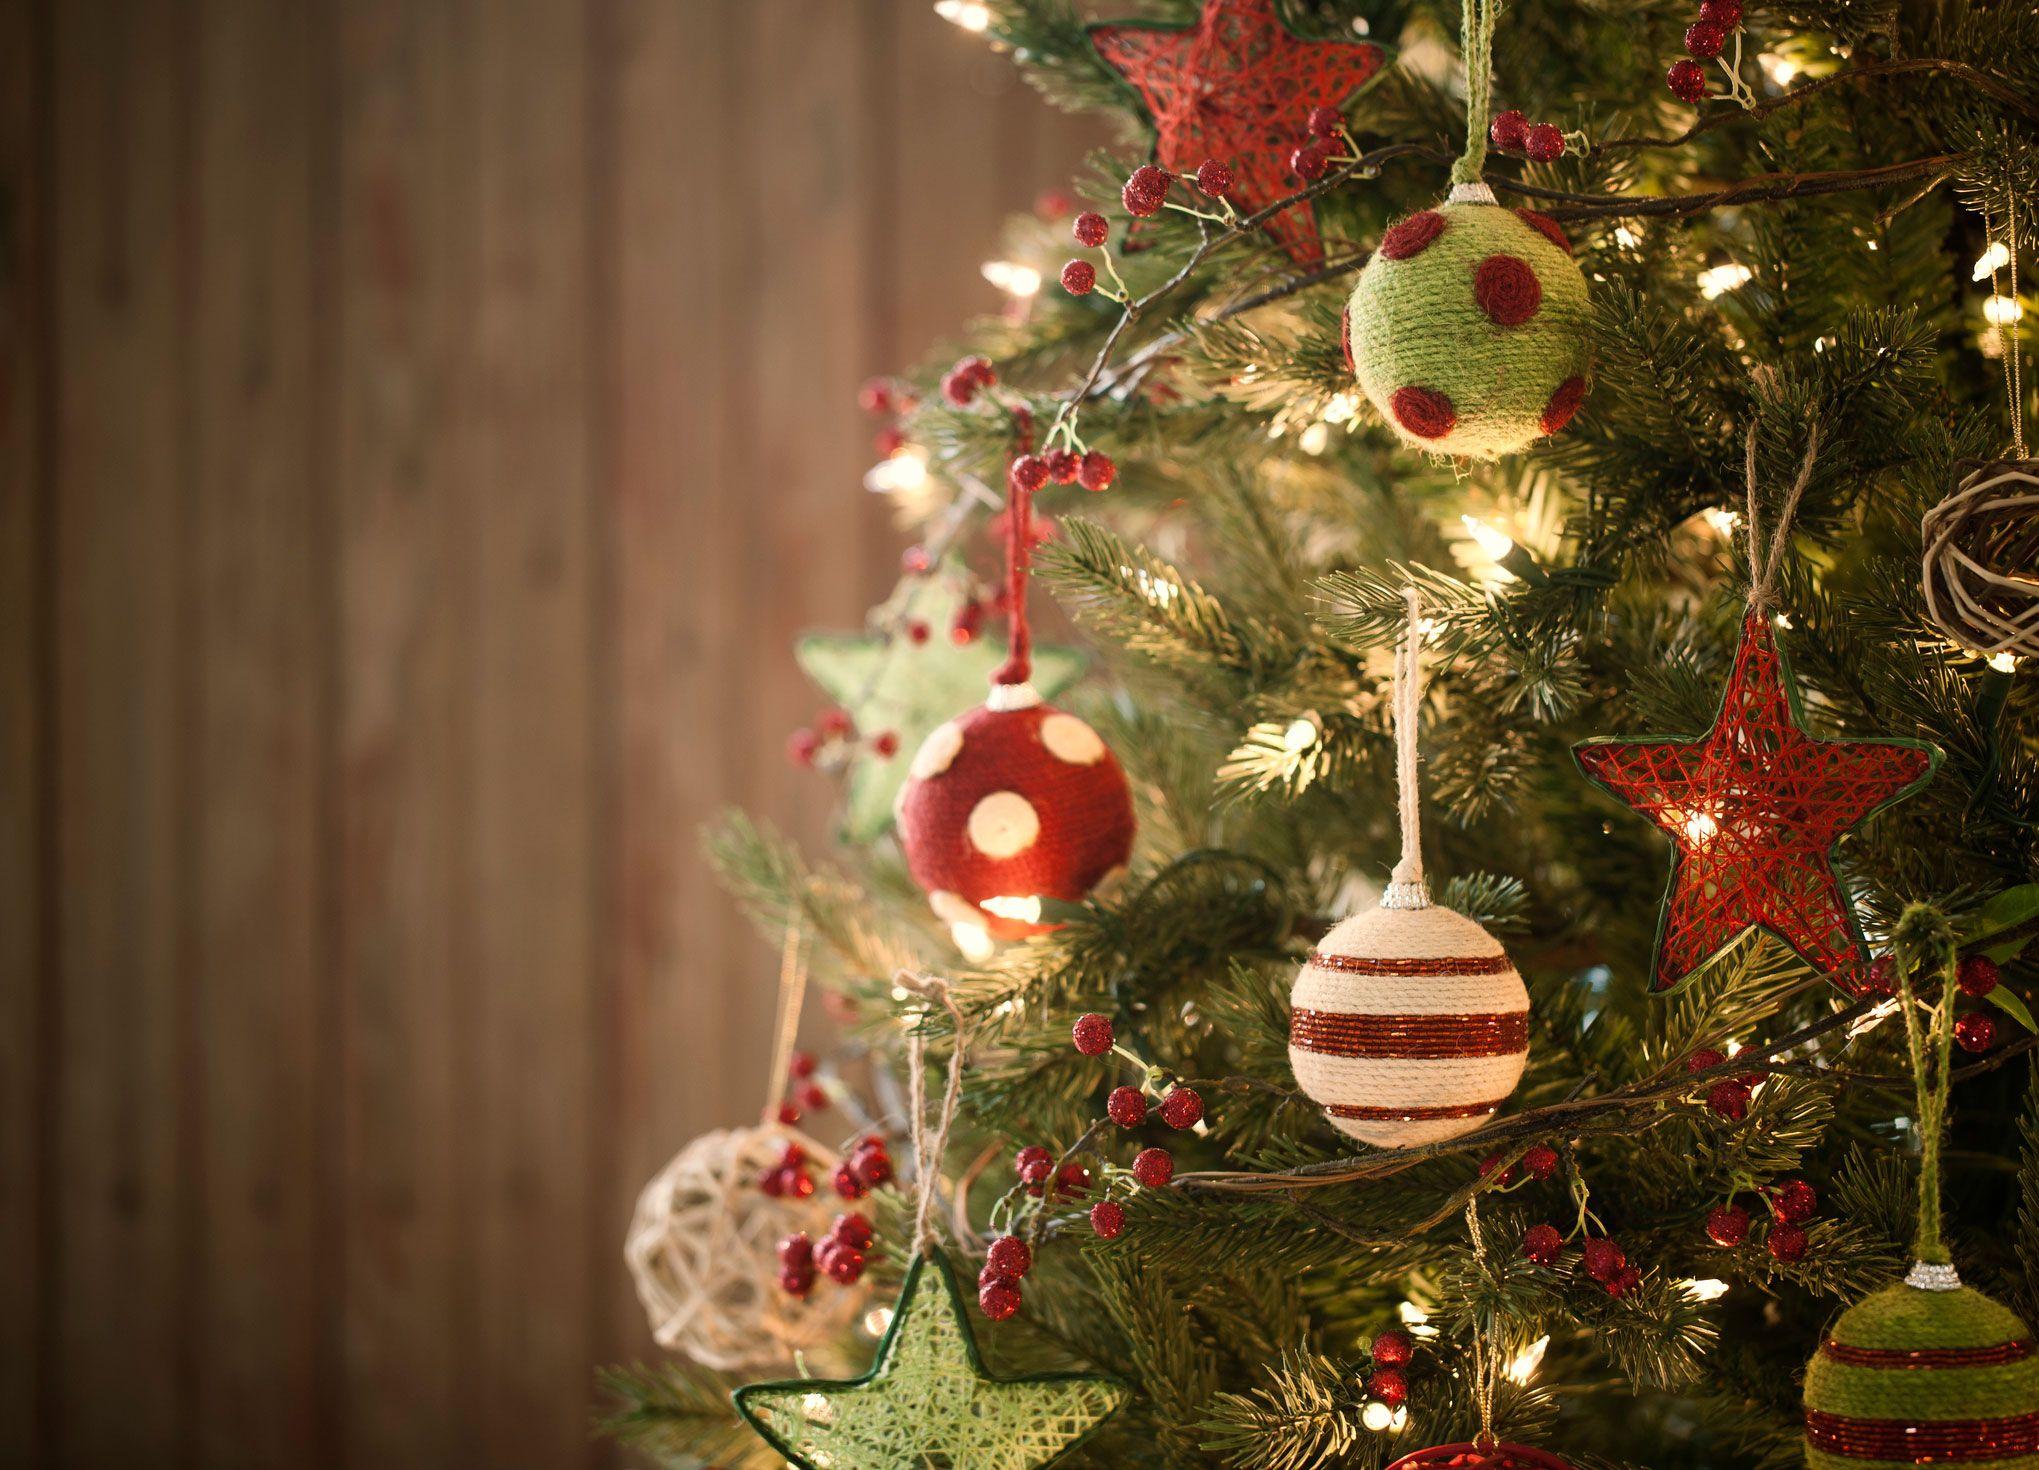 Décorez un sapin de Noël vert